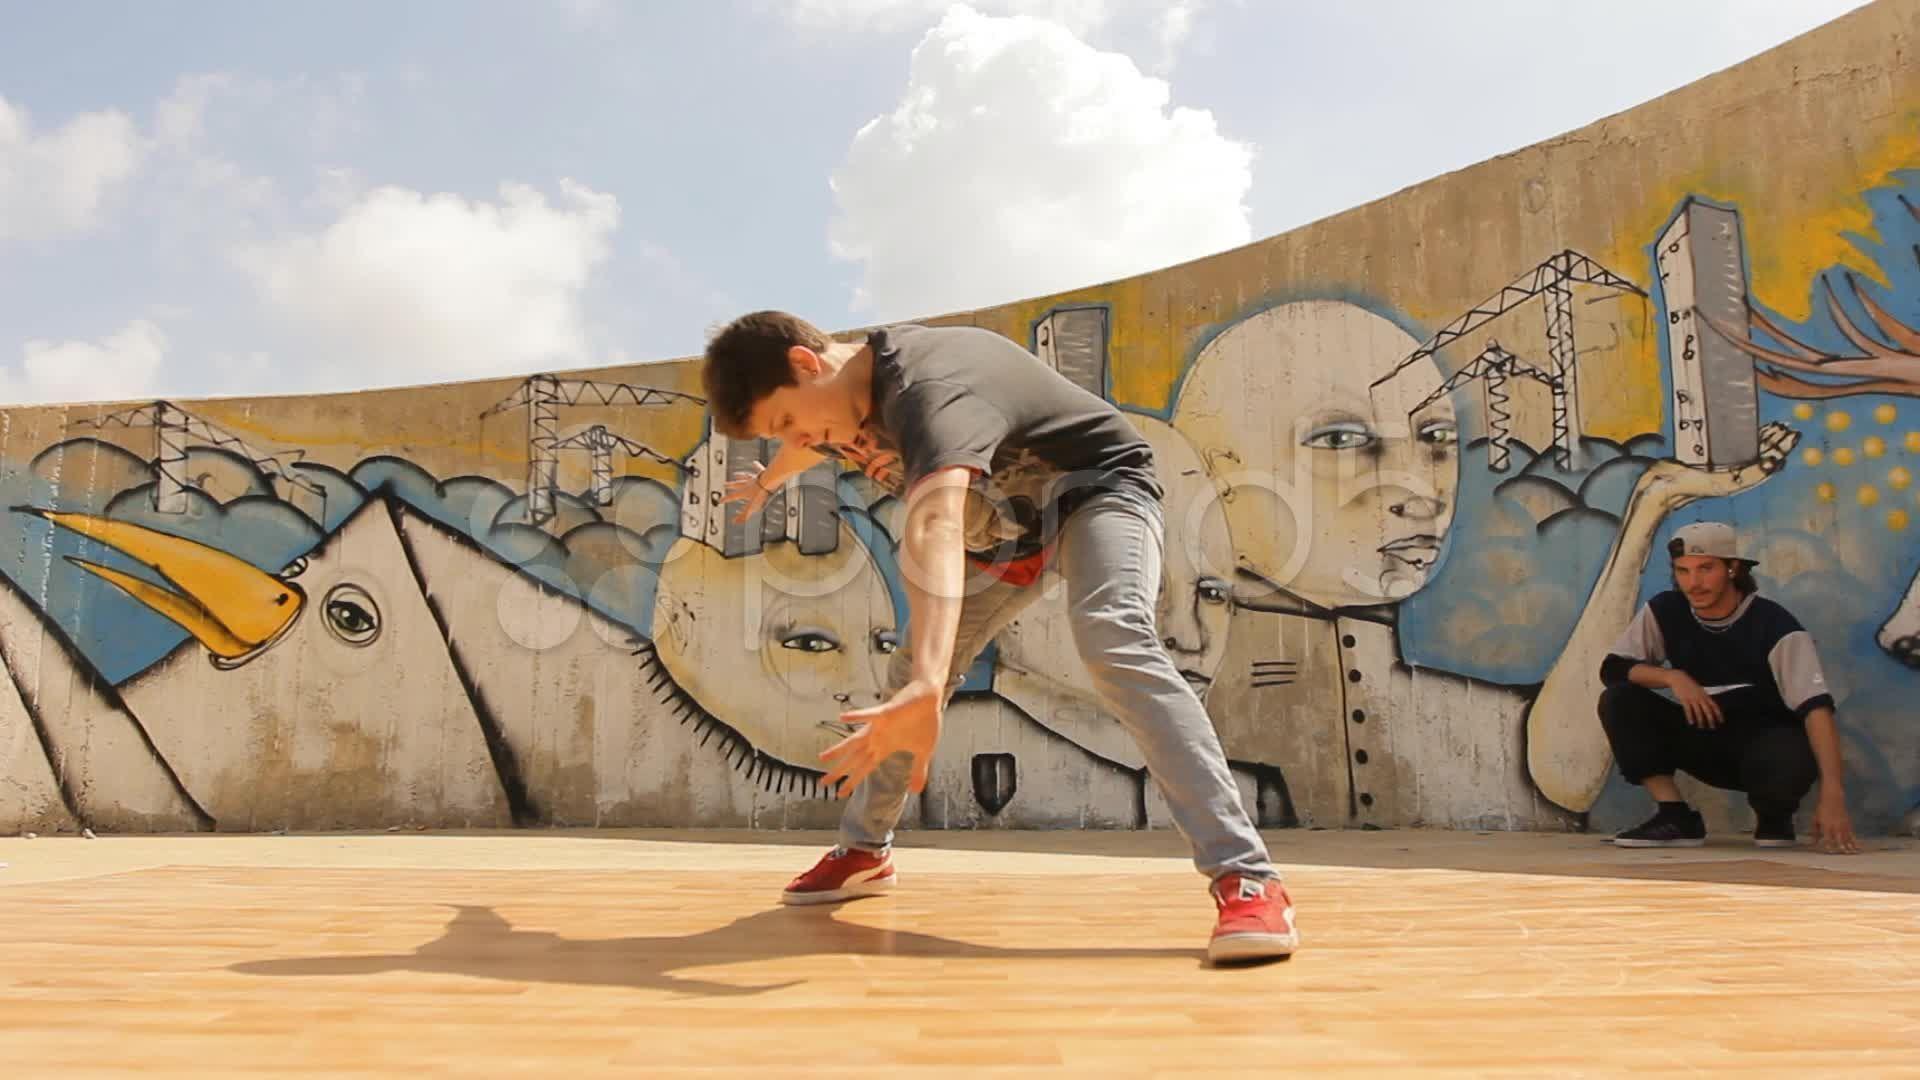 Cool Hiphop Teenager dancer dancing breakdance in action